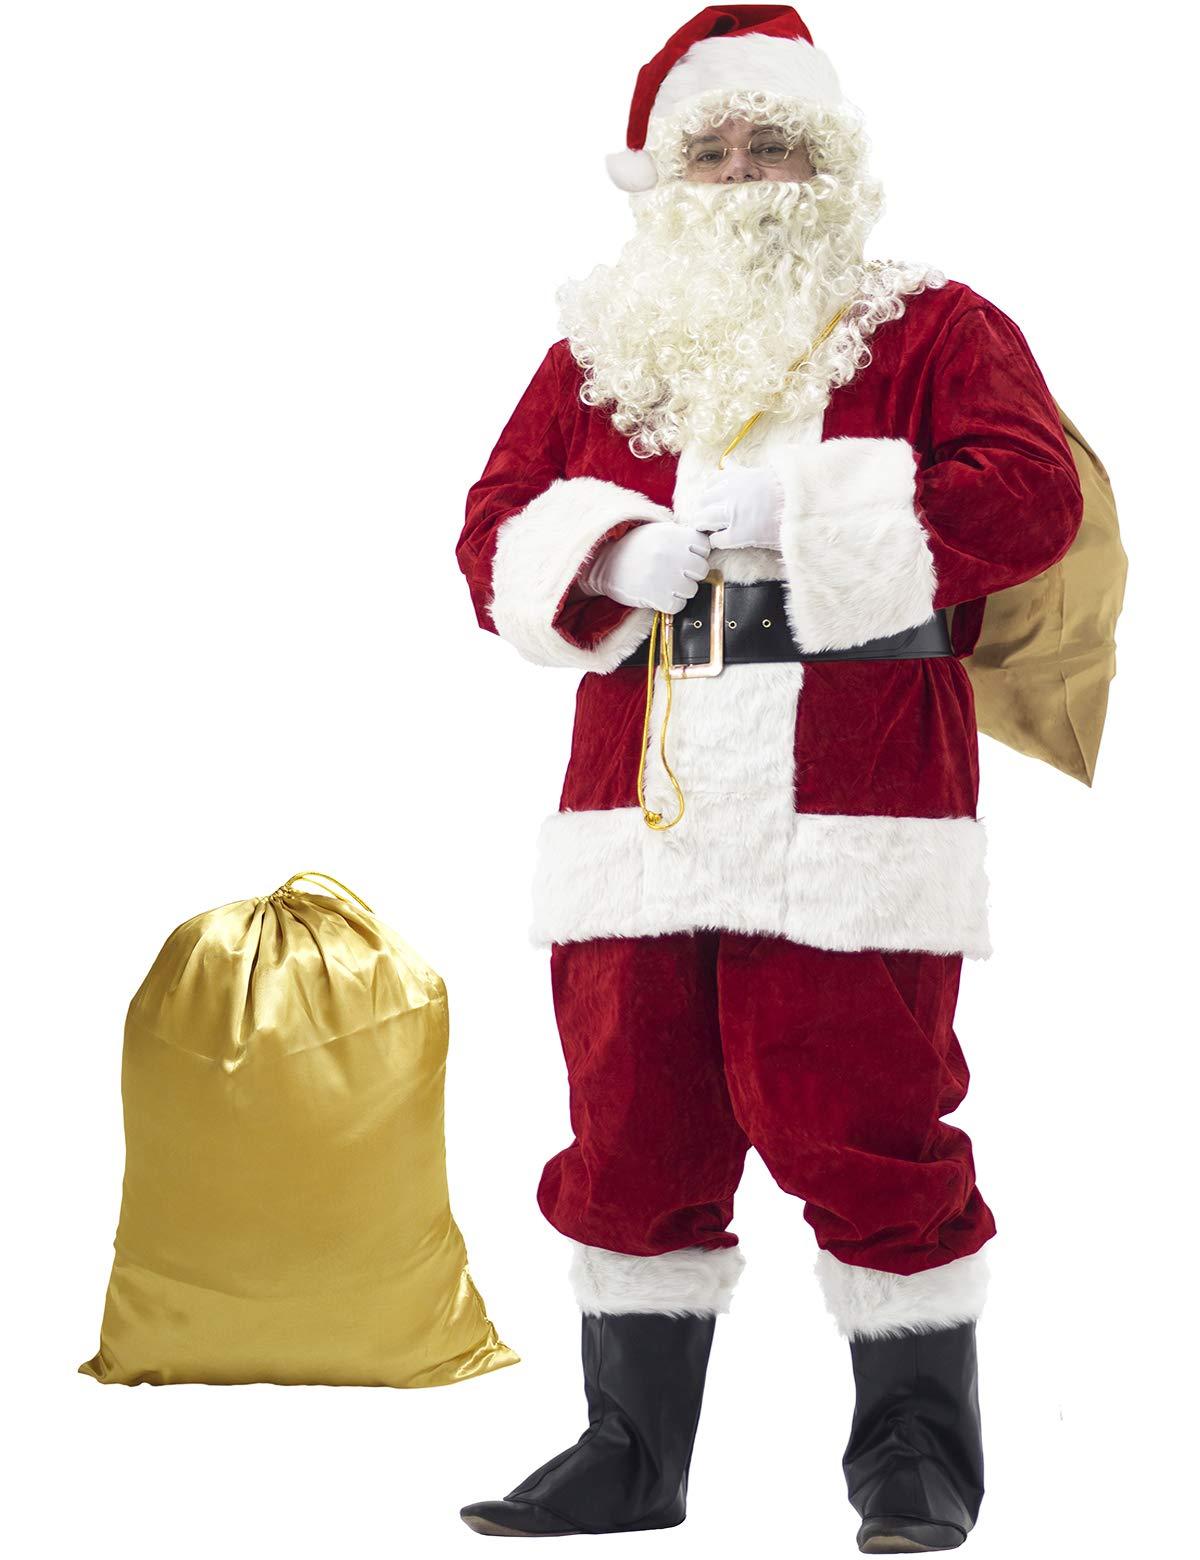 Ahititi Santa Suit Adult Costume 10pc. 2XL Red by Ahititi